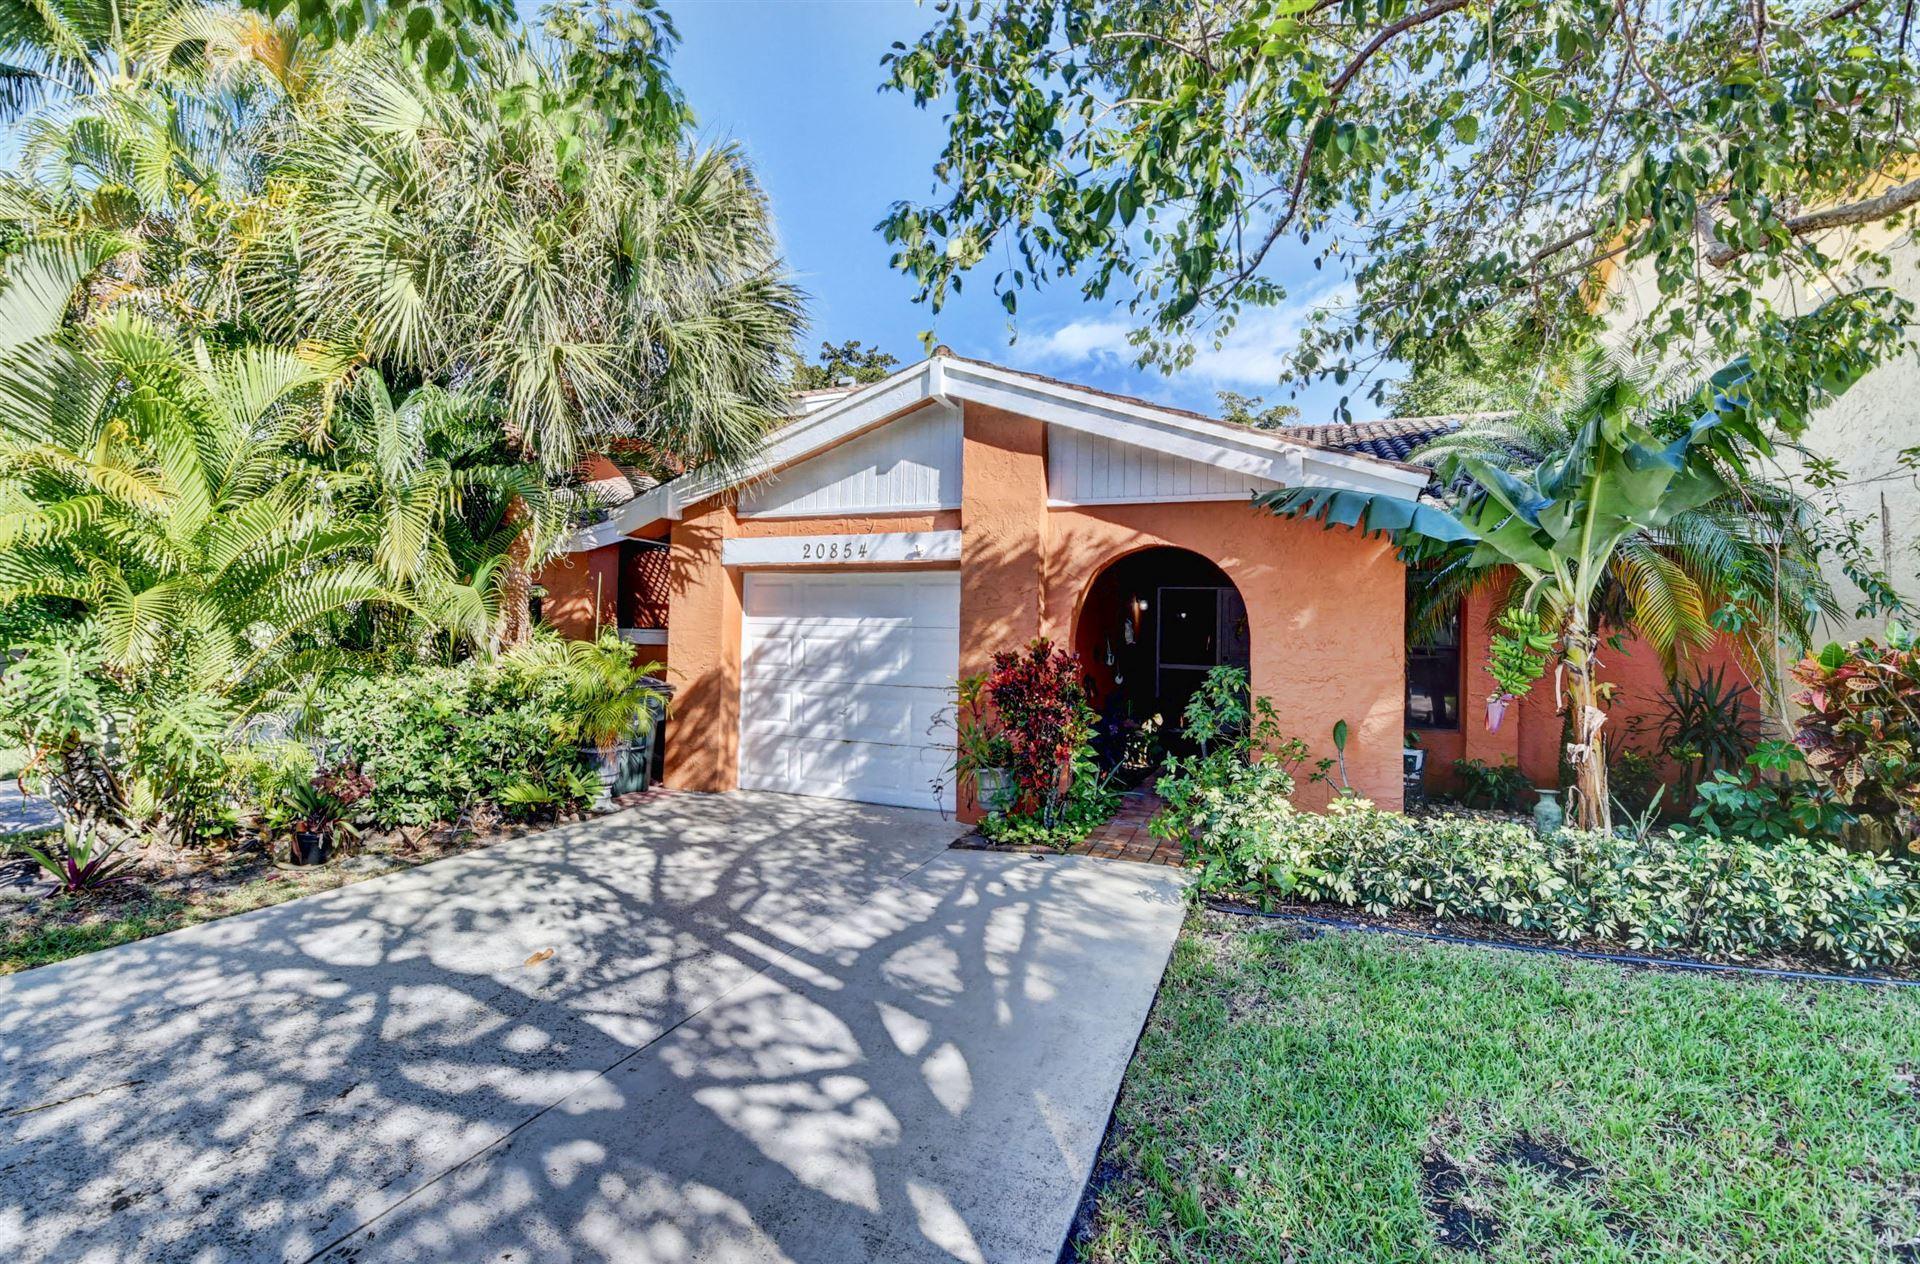 Photo of 20854 Via Valencia Drive #20854, Boca Raton, FL 33433 (MLS # RX-10678000)